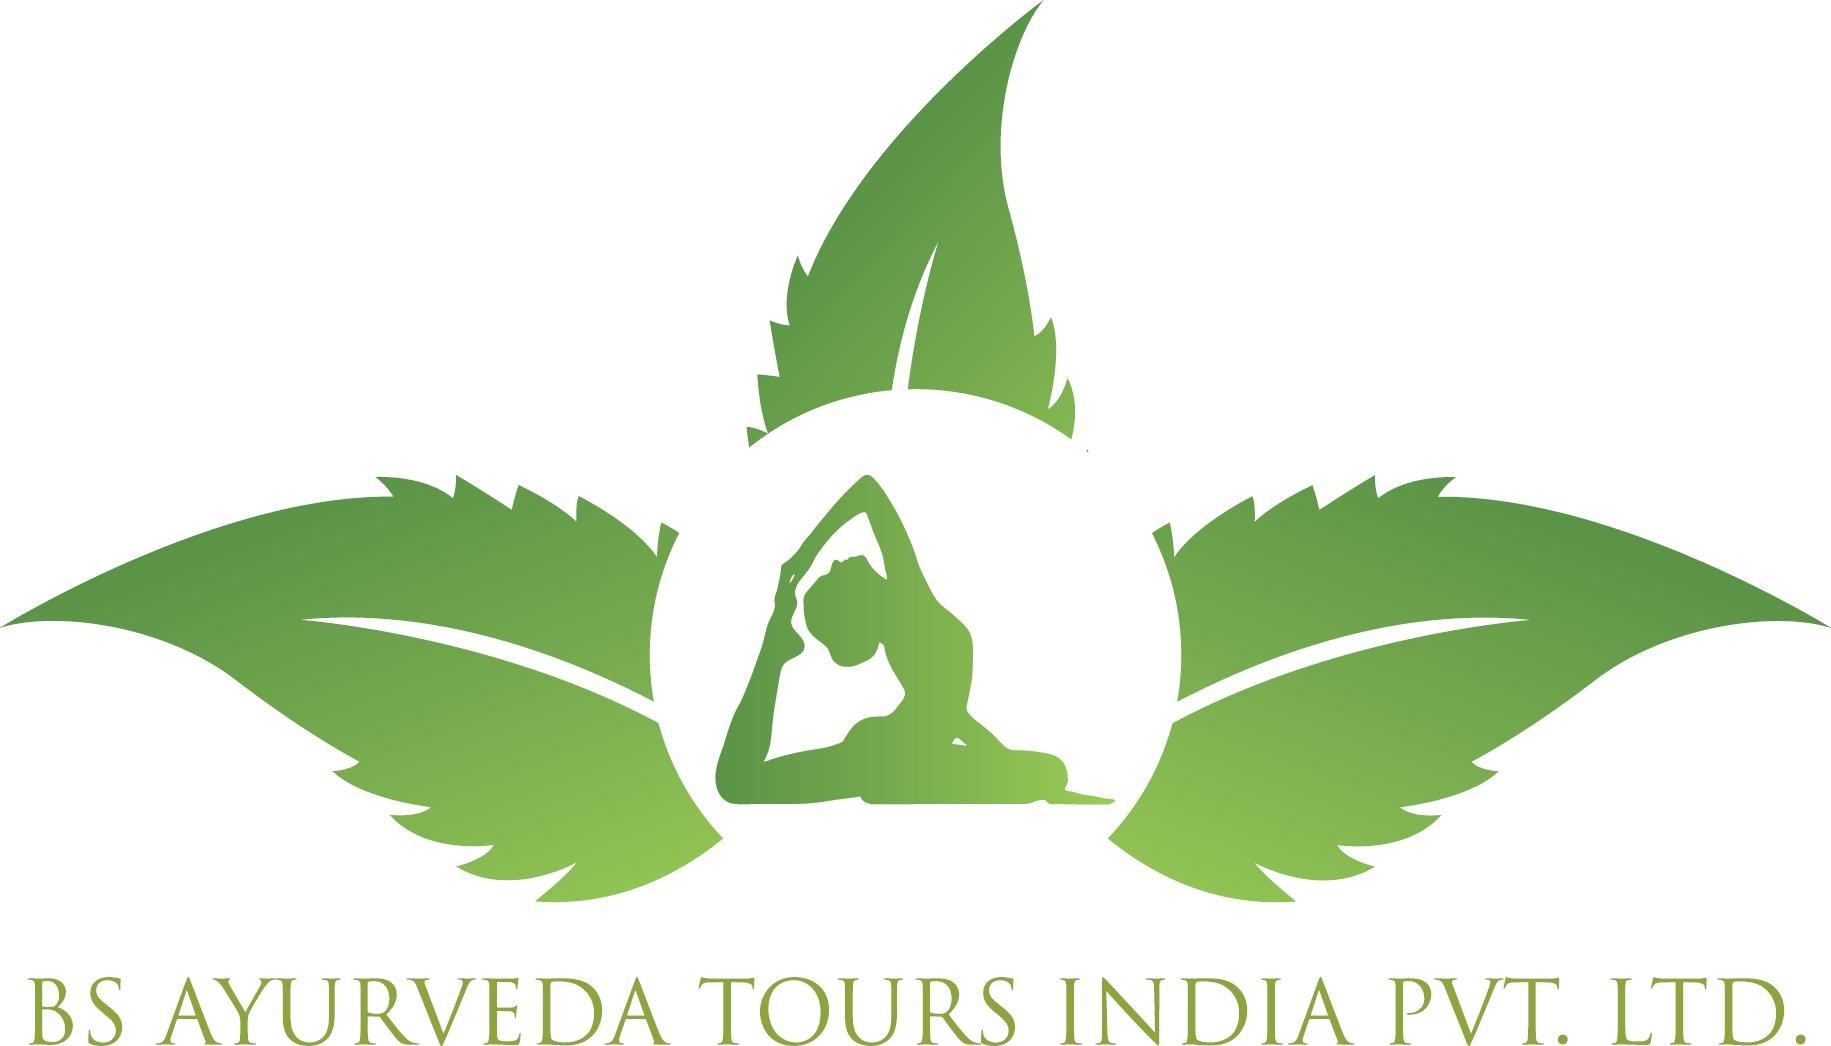 BS Ayurveda Tours India